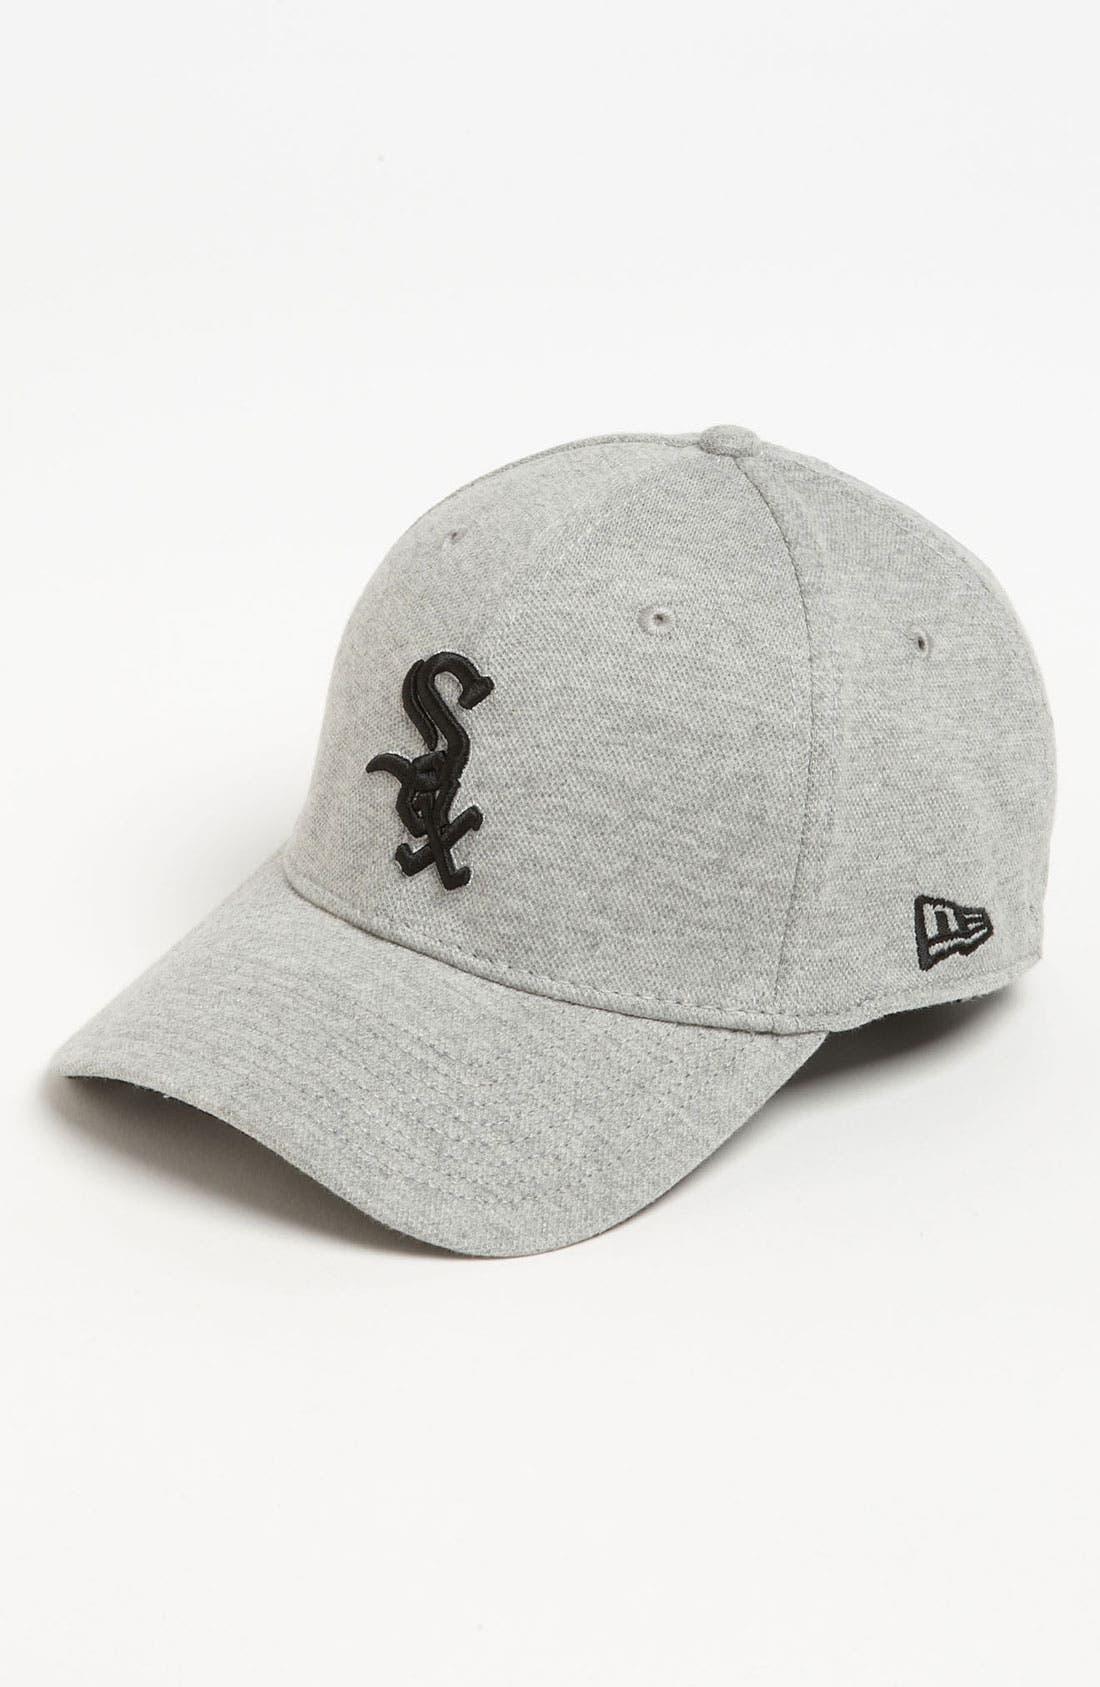 Main Image - New Era Cap 'Spring Stretch - Chicago White Sox' Baseball Cap